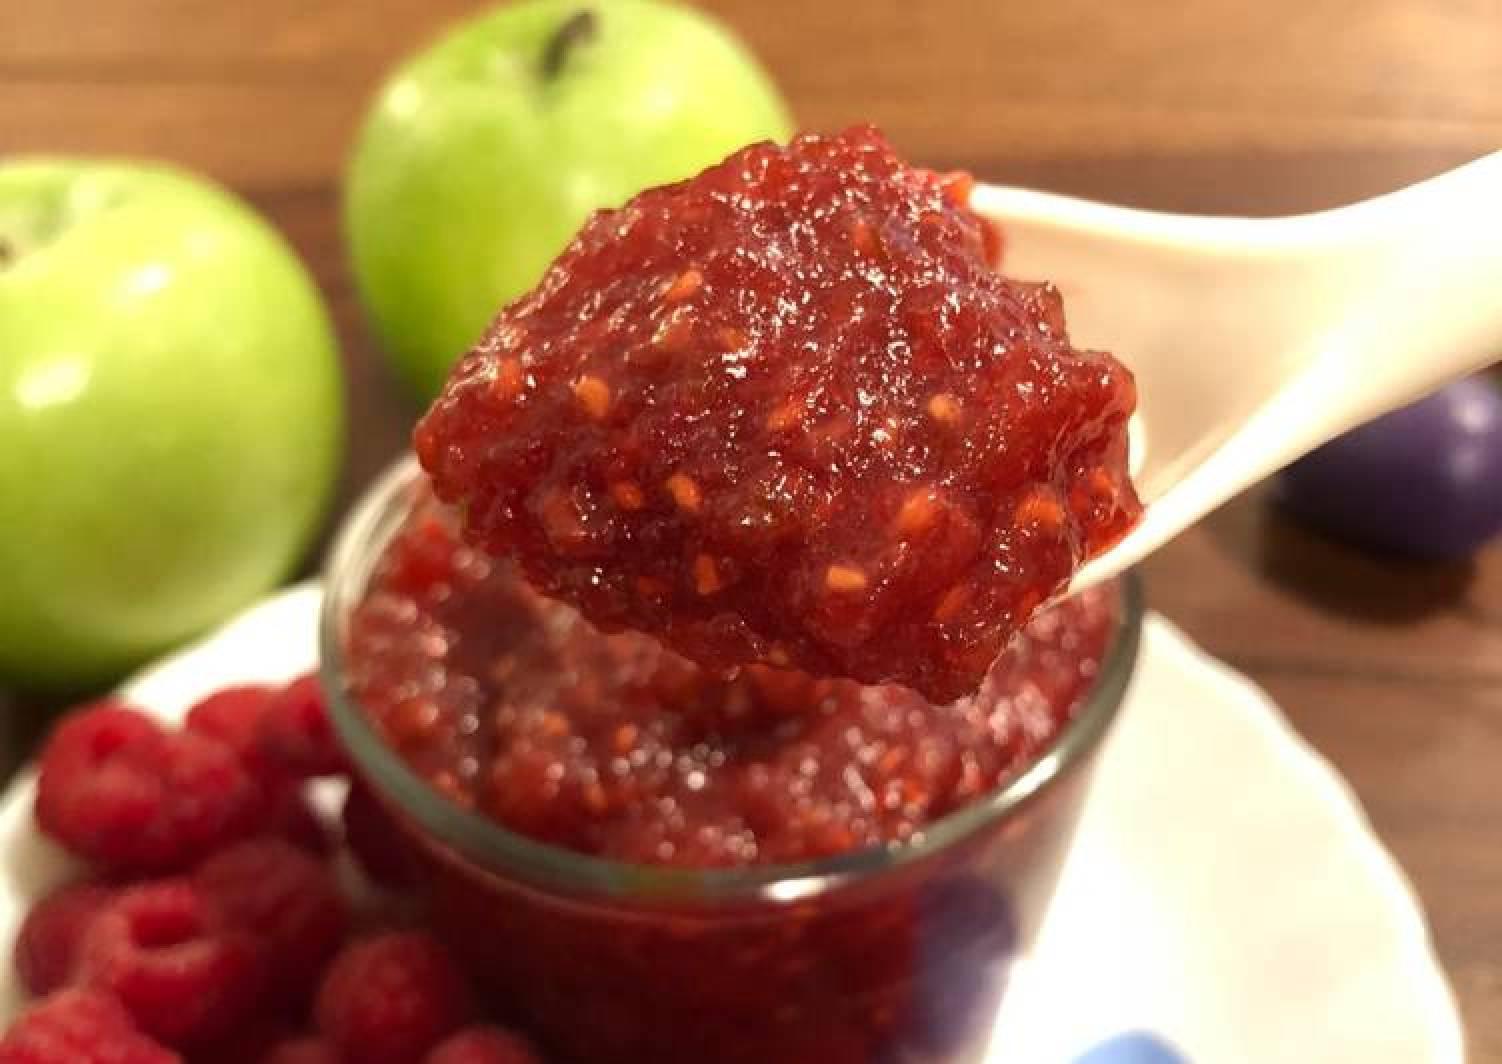 Raspberry Jam Without Pectin – Homemade Jam Recipe